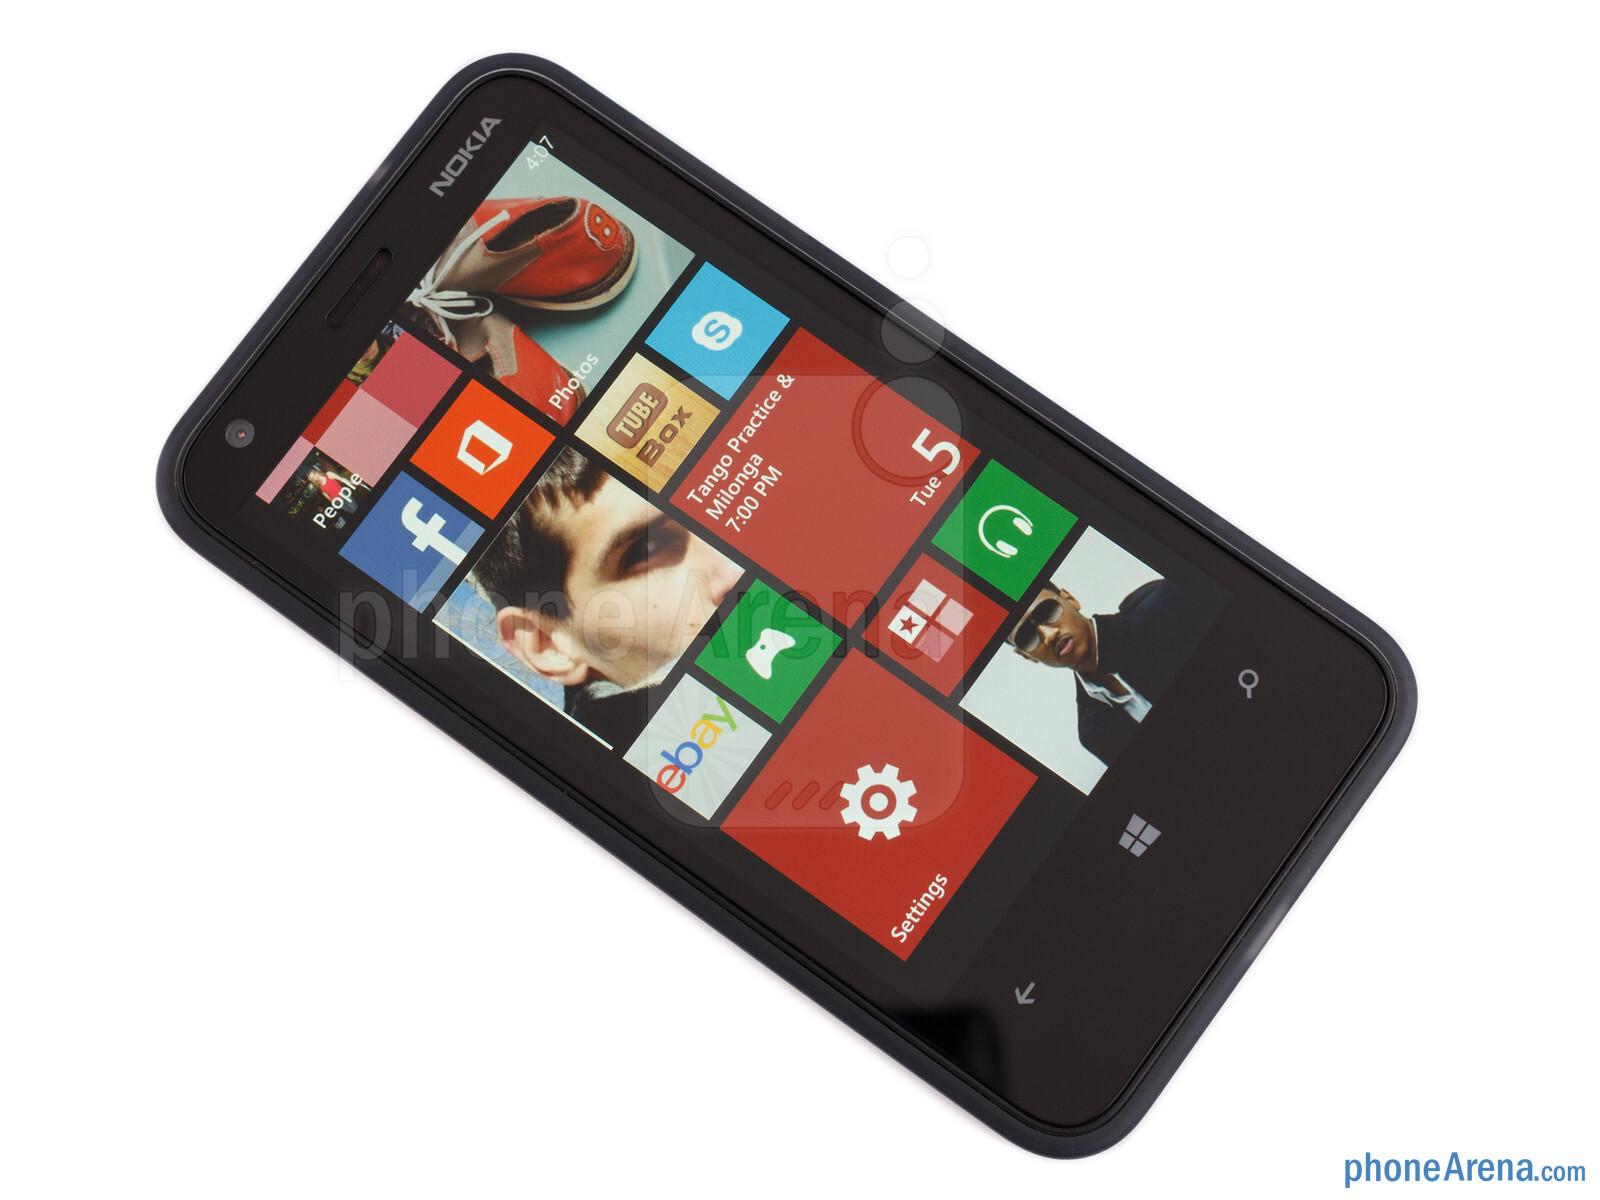 Nokia Lumia 620 Review - PhoneArena